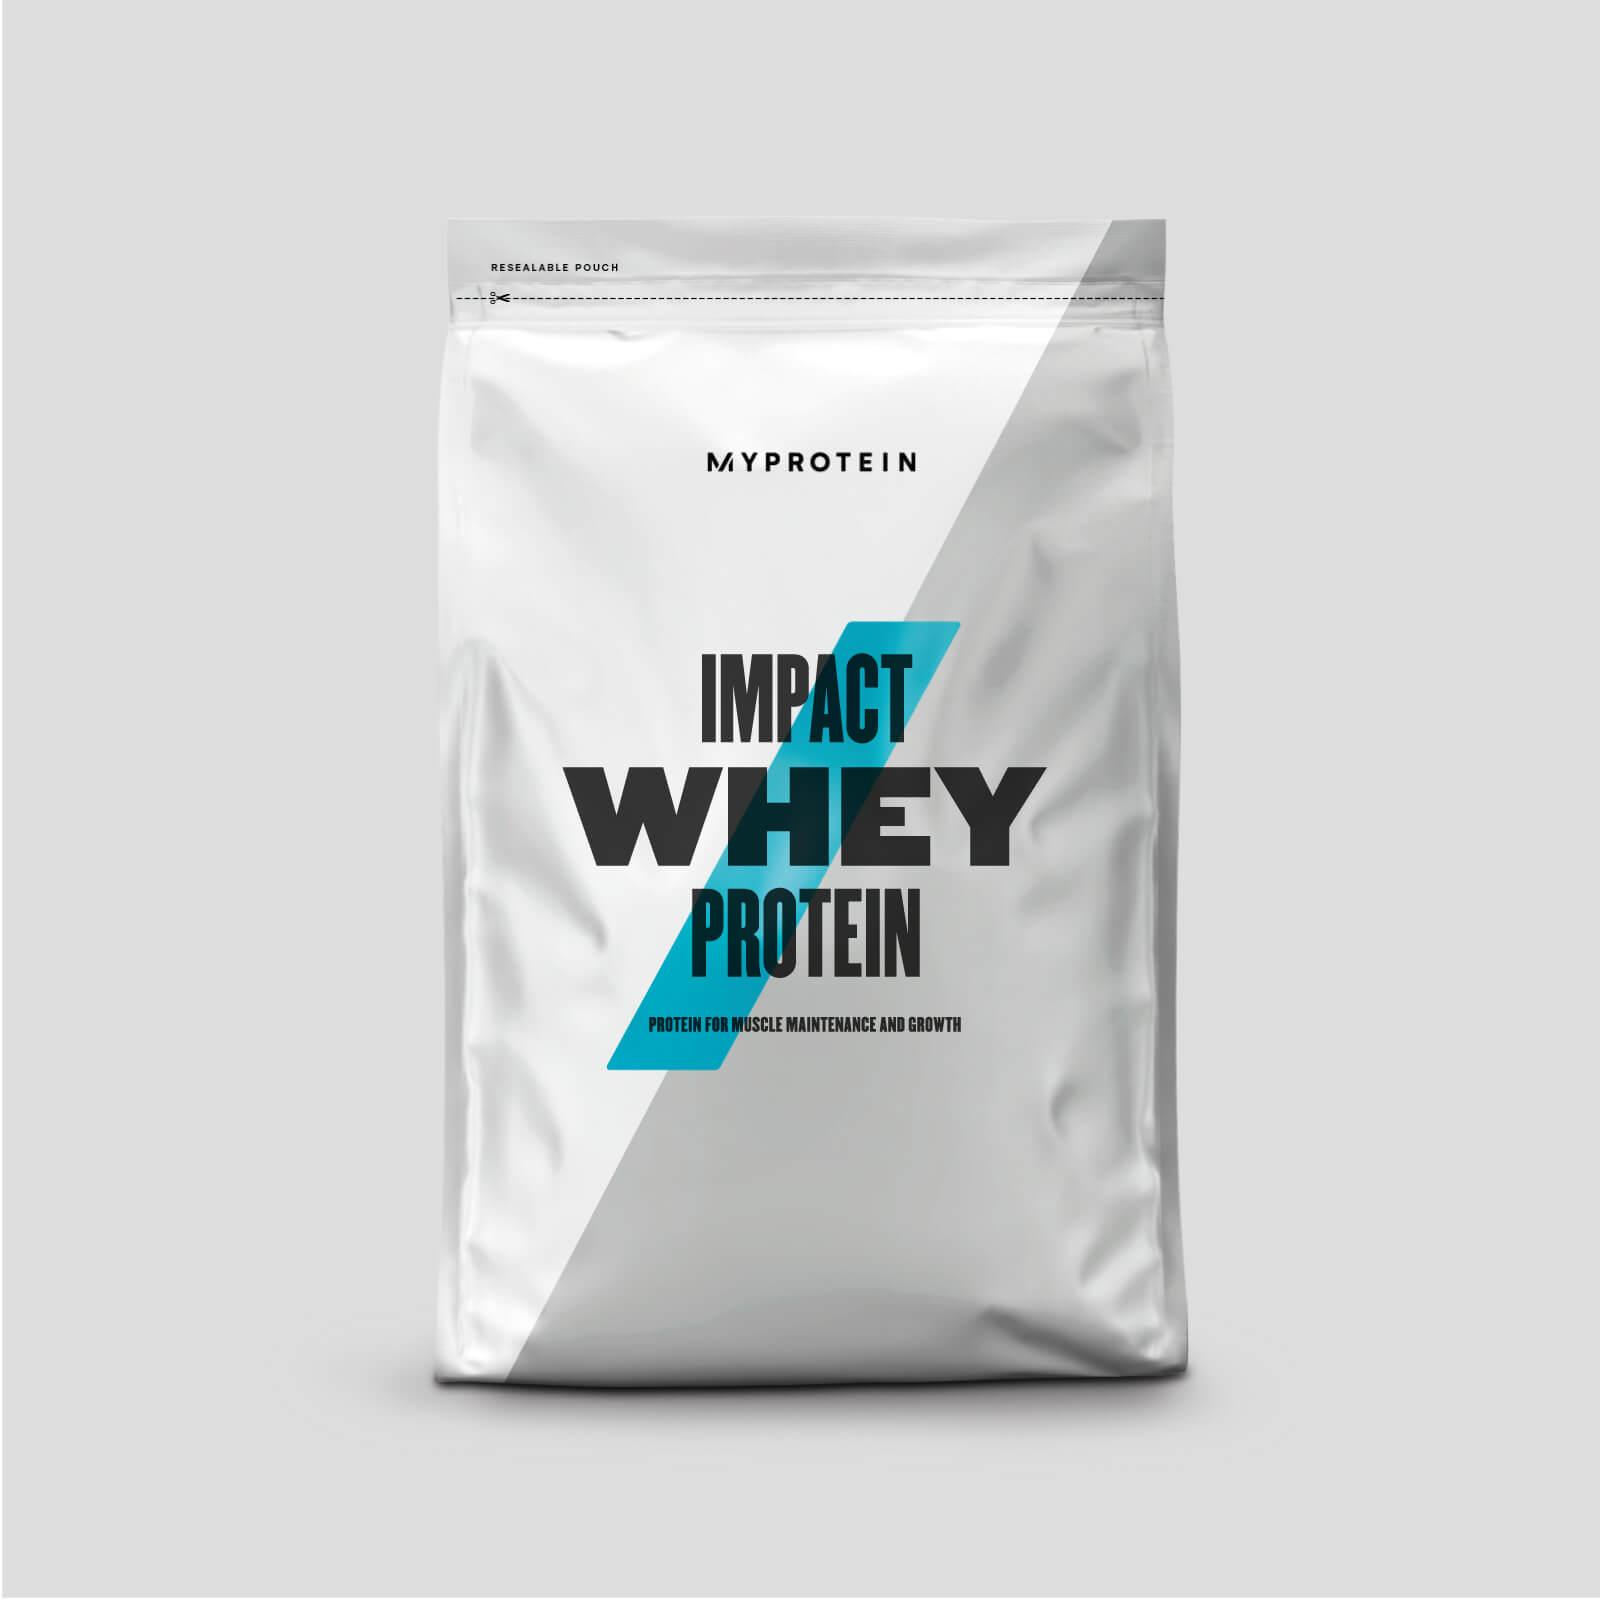 Myprotein Impact Whey Protein - 1kg - Stevia - Chocolat à la menthe